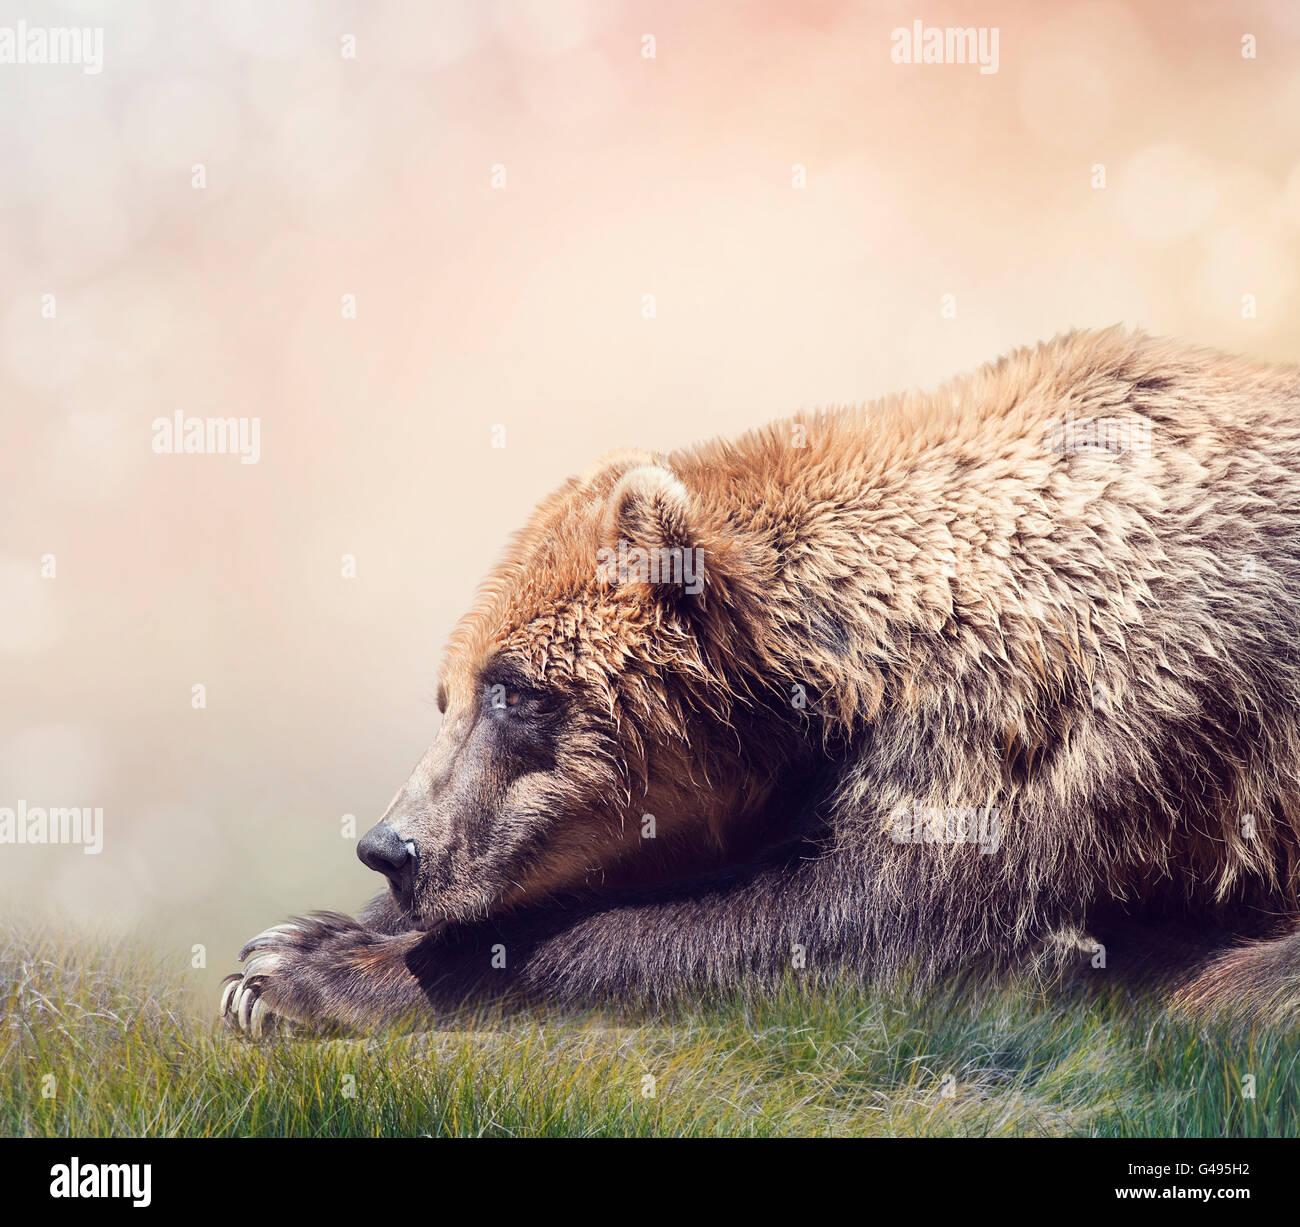 Brown Bear Resting,close up shot - Stock Image